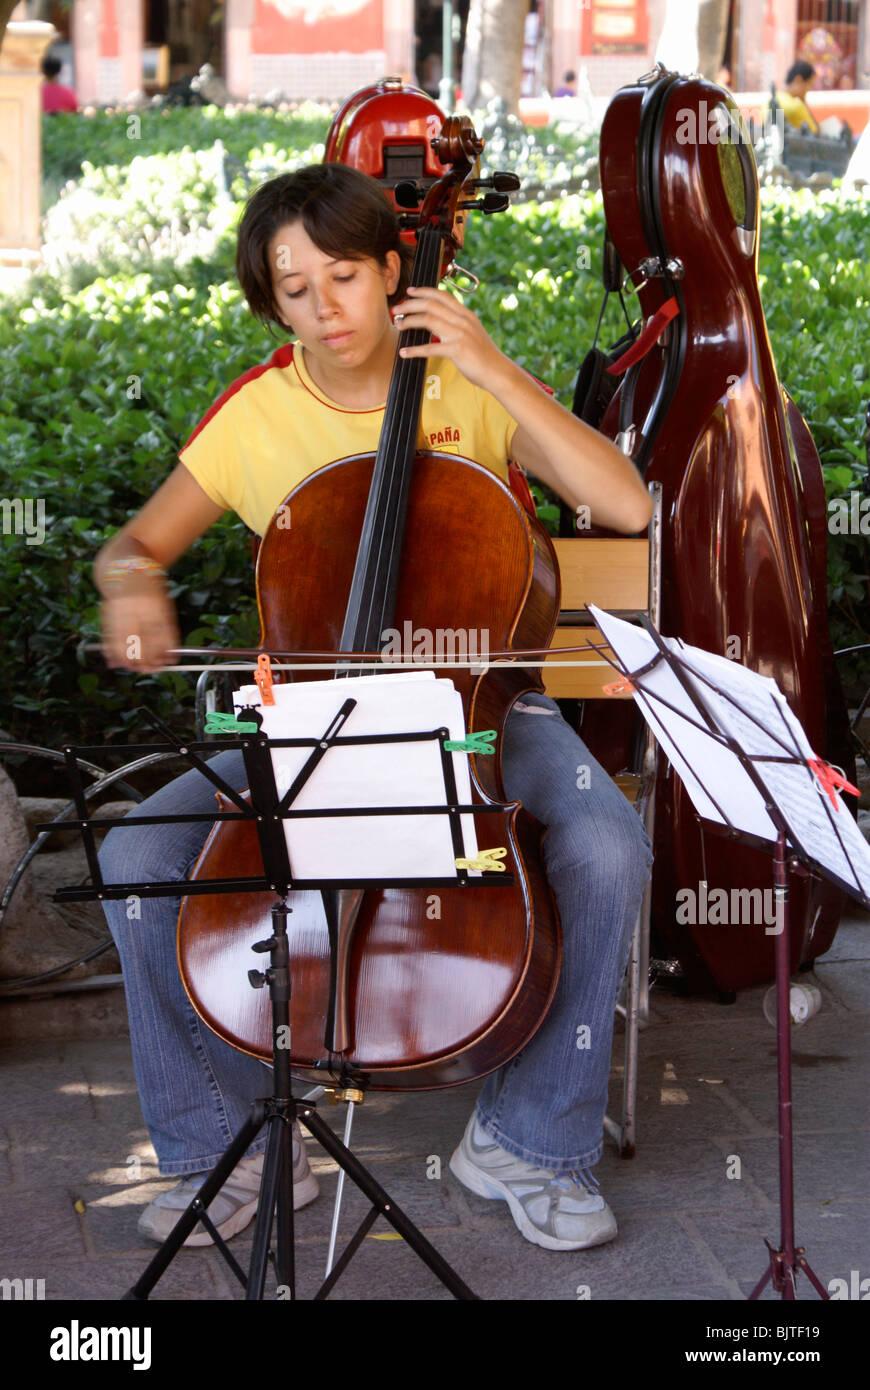 Young female music student playing the cello in El Jardin, San Miguel de Allende, Guanajuato, Mexico - Stock Image